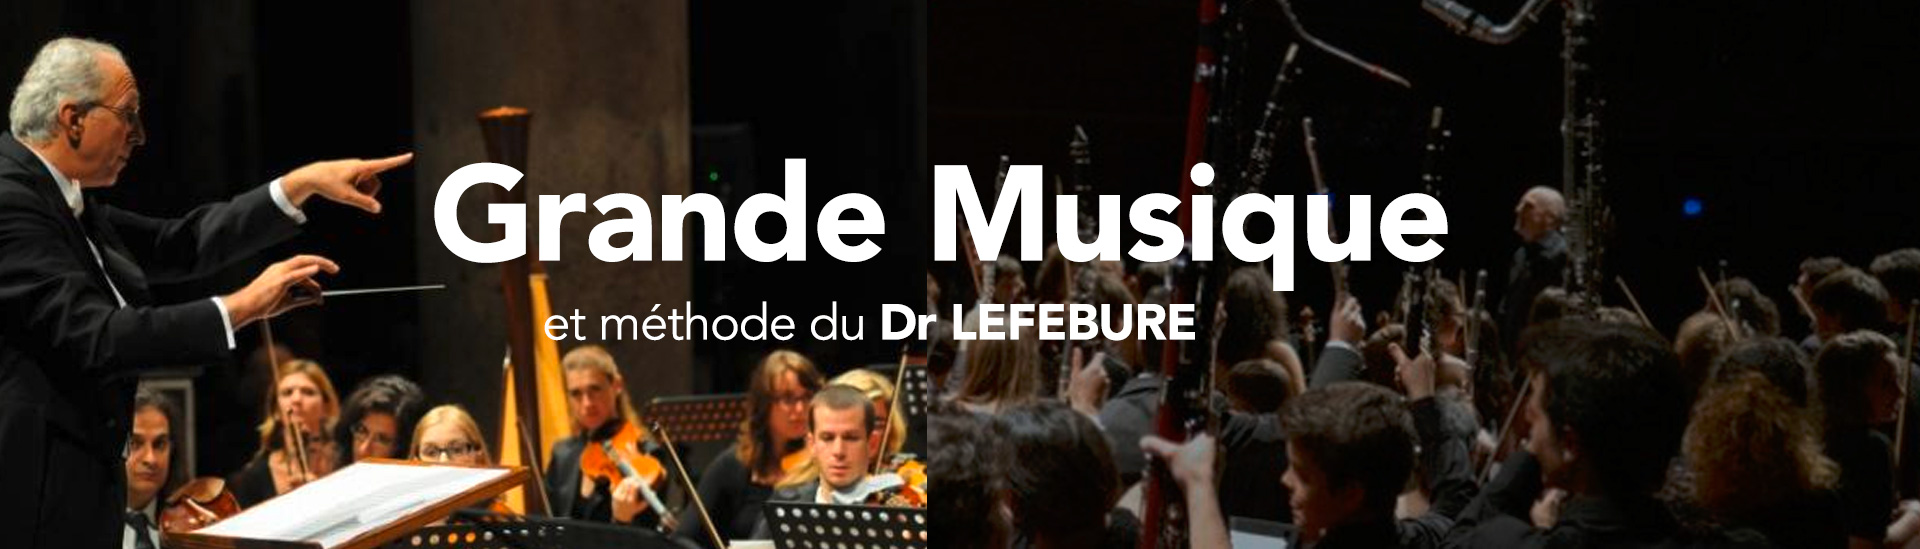 Phosphenisme-et-Grande-Musique